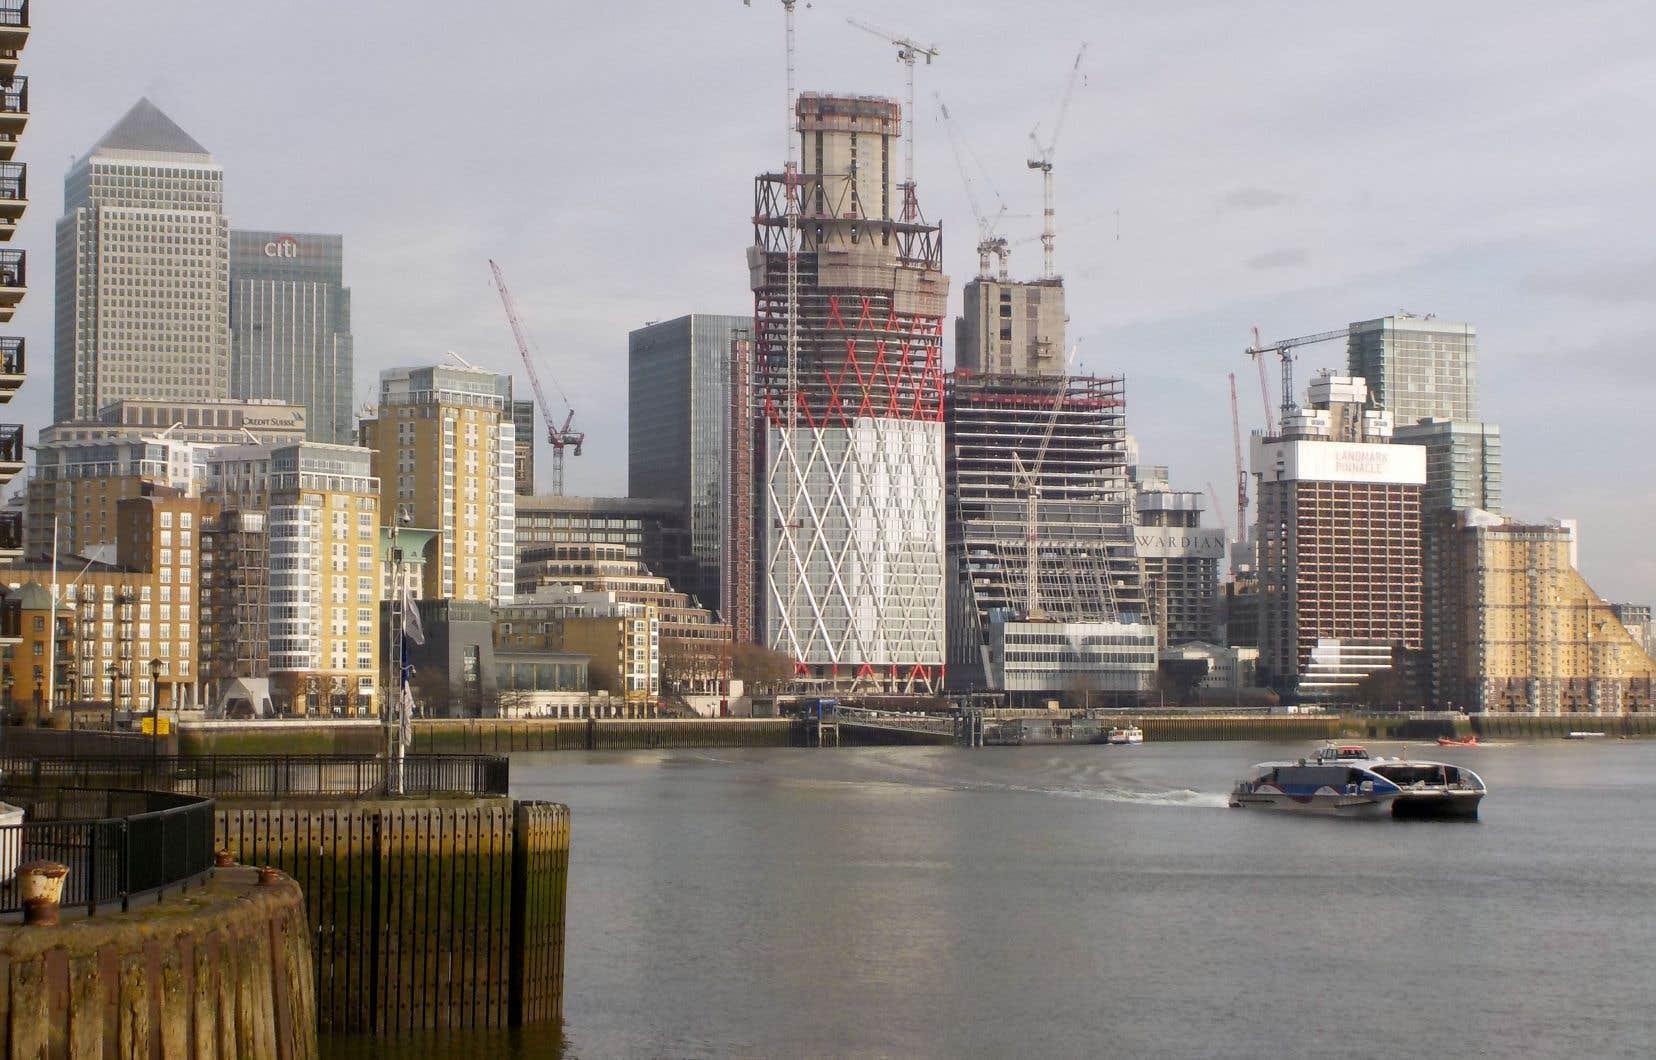 Les gratte-ciel de Canary Wharf